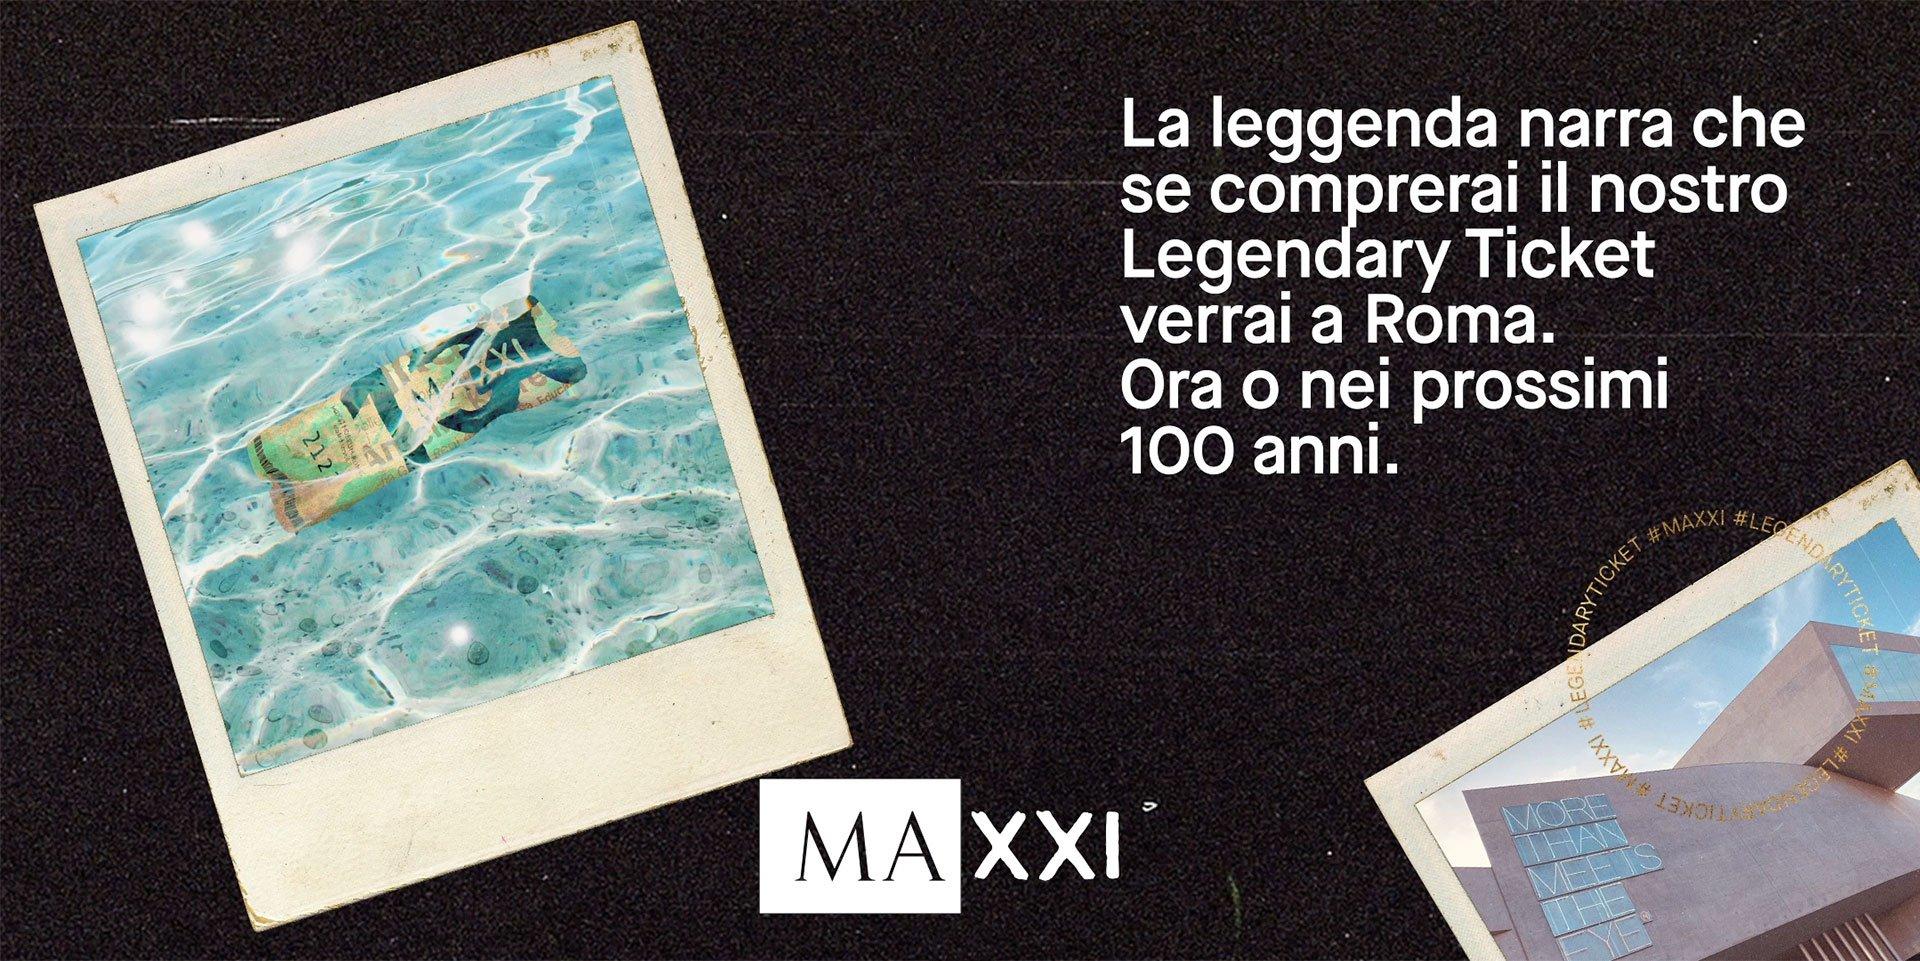 MAXXI, Legendary Ticket